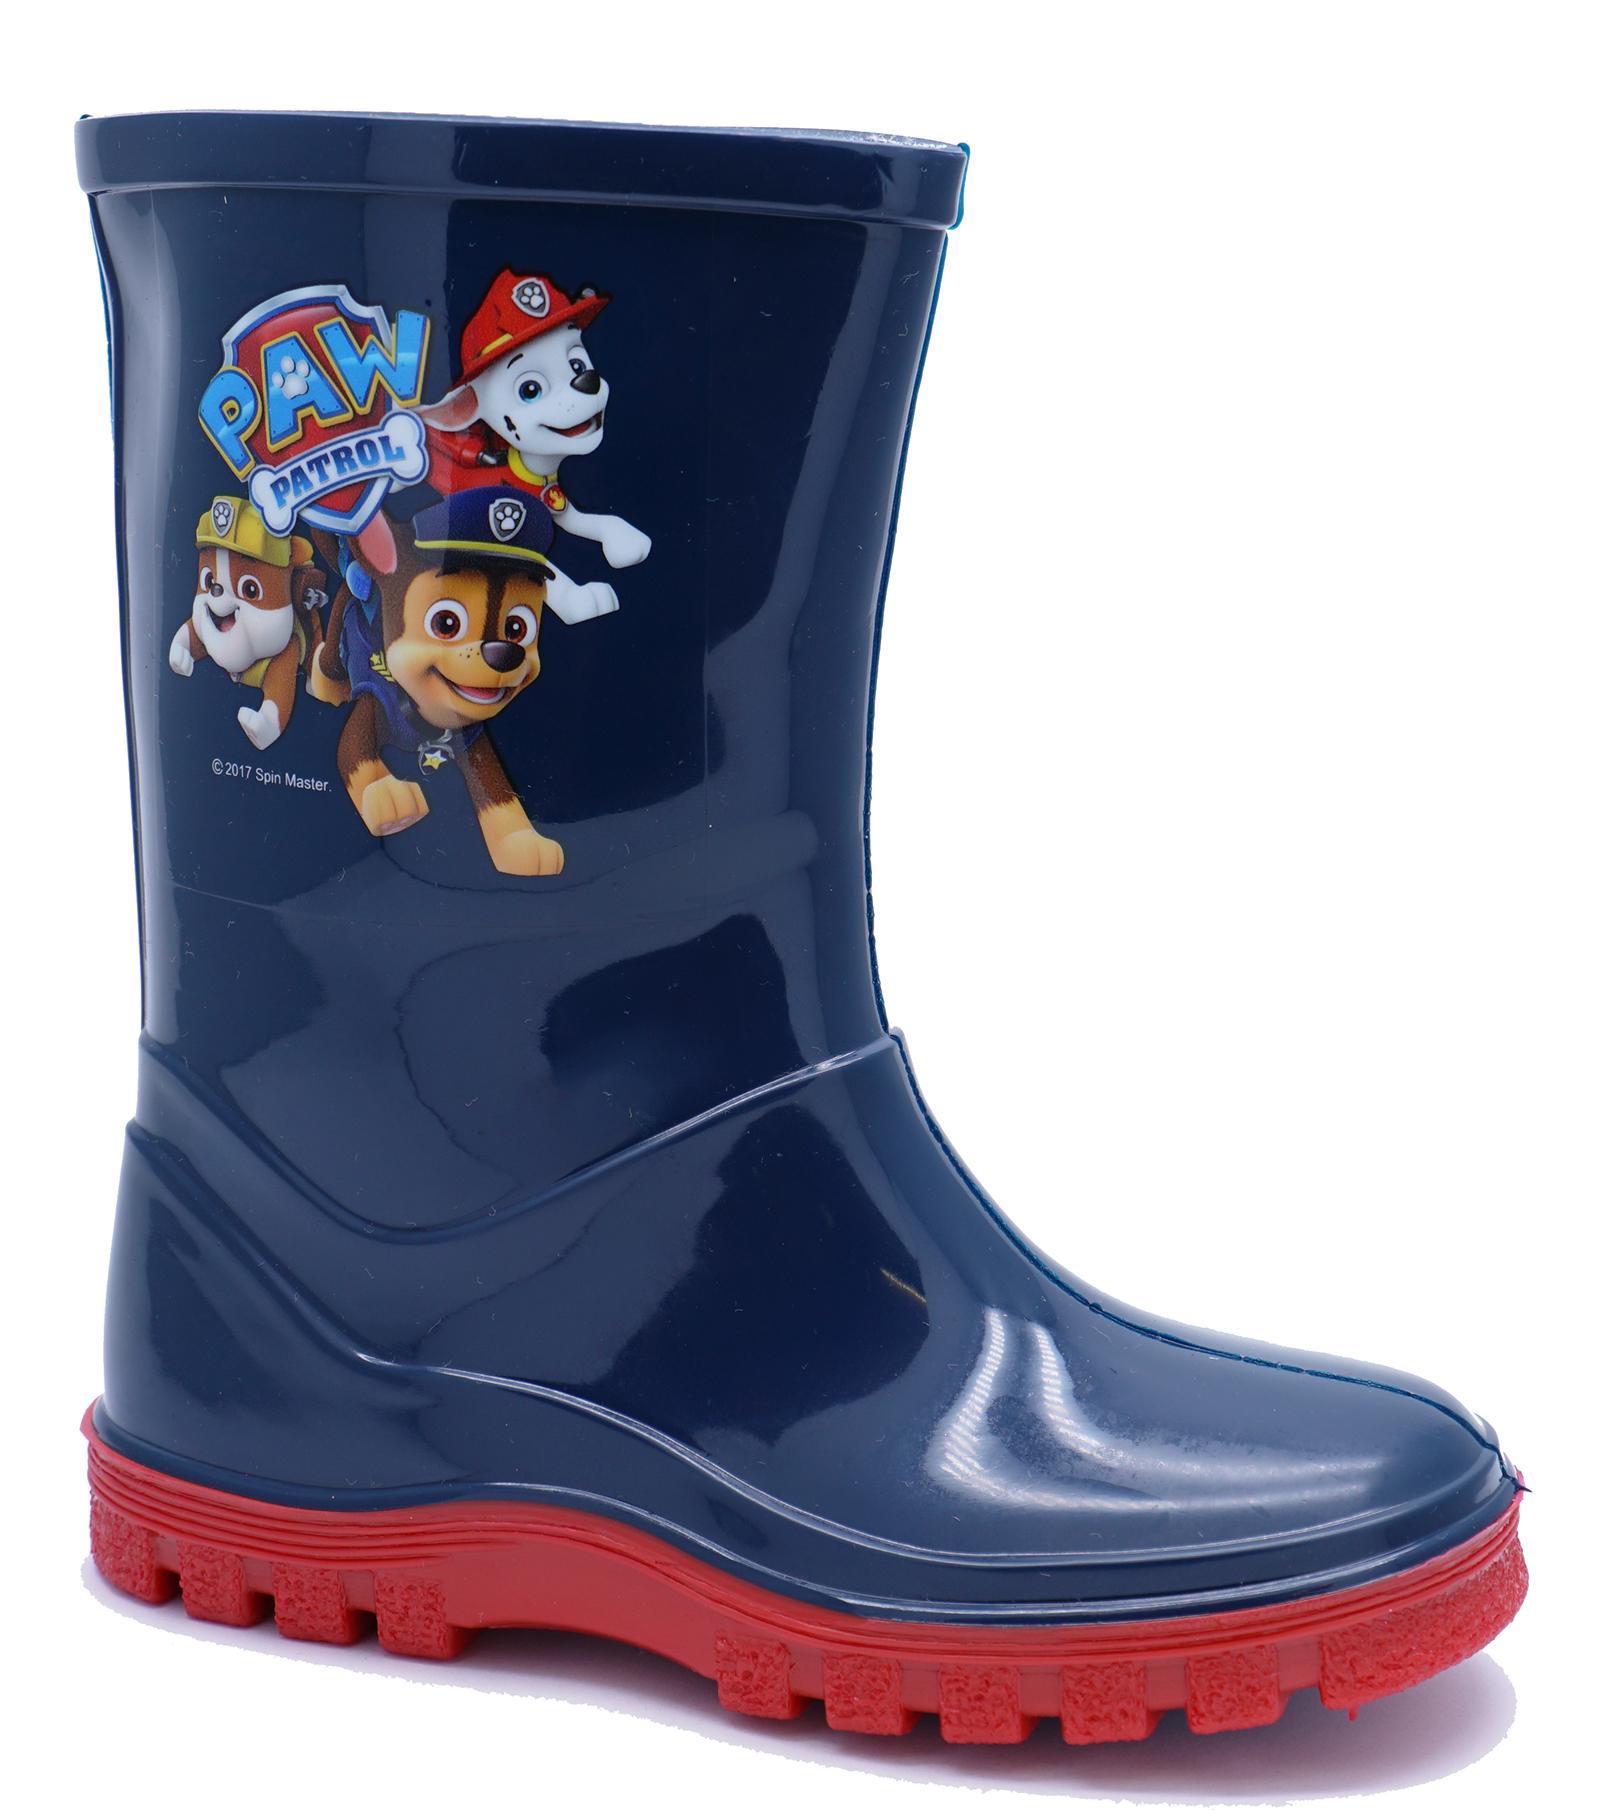 BOYS-KIDS-NAVY-PAW-PATROL-WELLIES-WELLINGTON-SPLASH-RAIN-INFANTS-BOOTS-UK-4-10 thumbnail 5